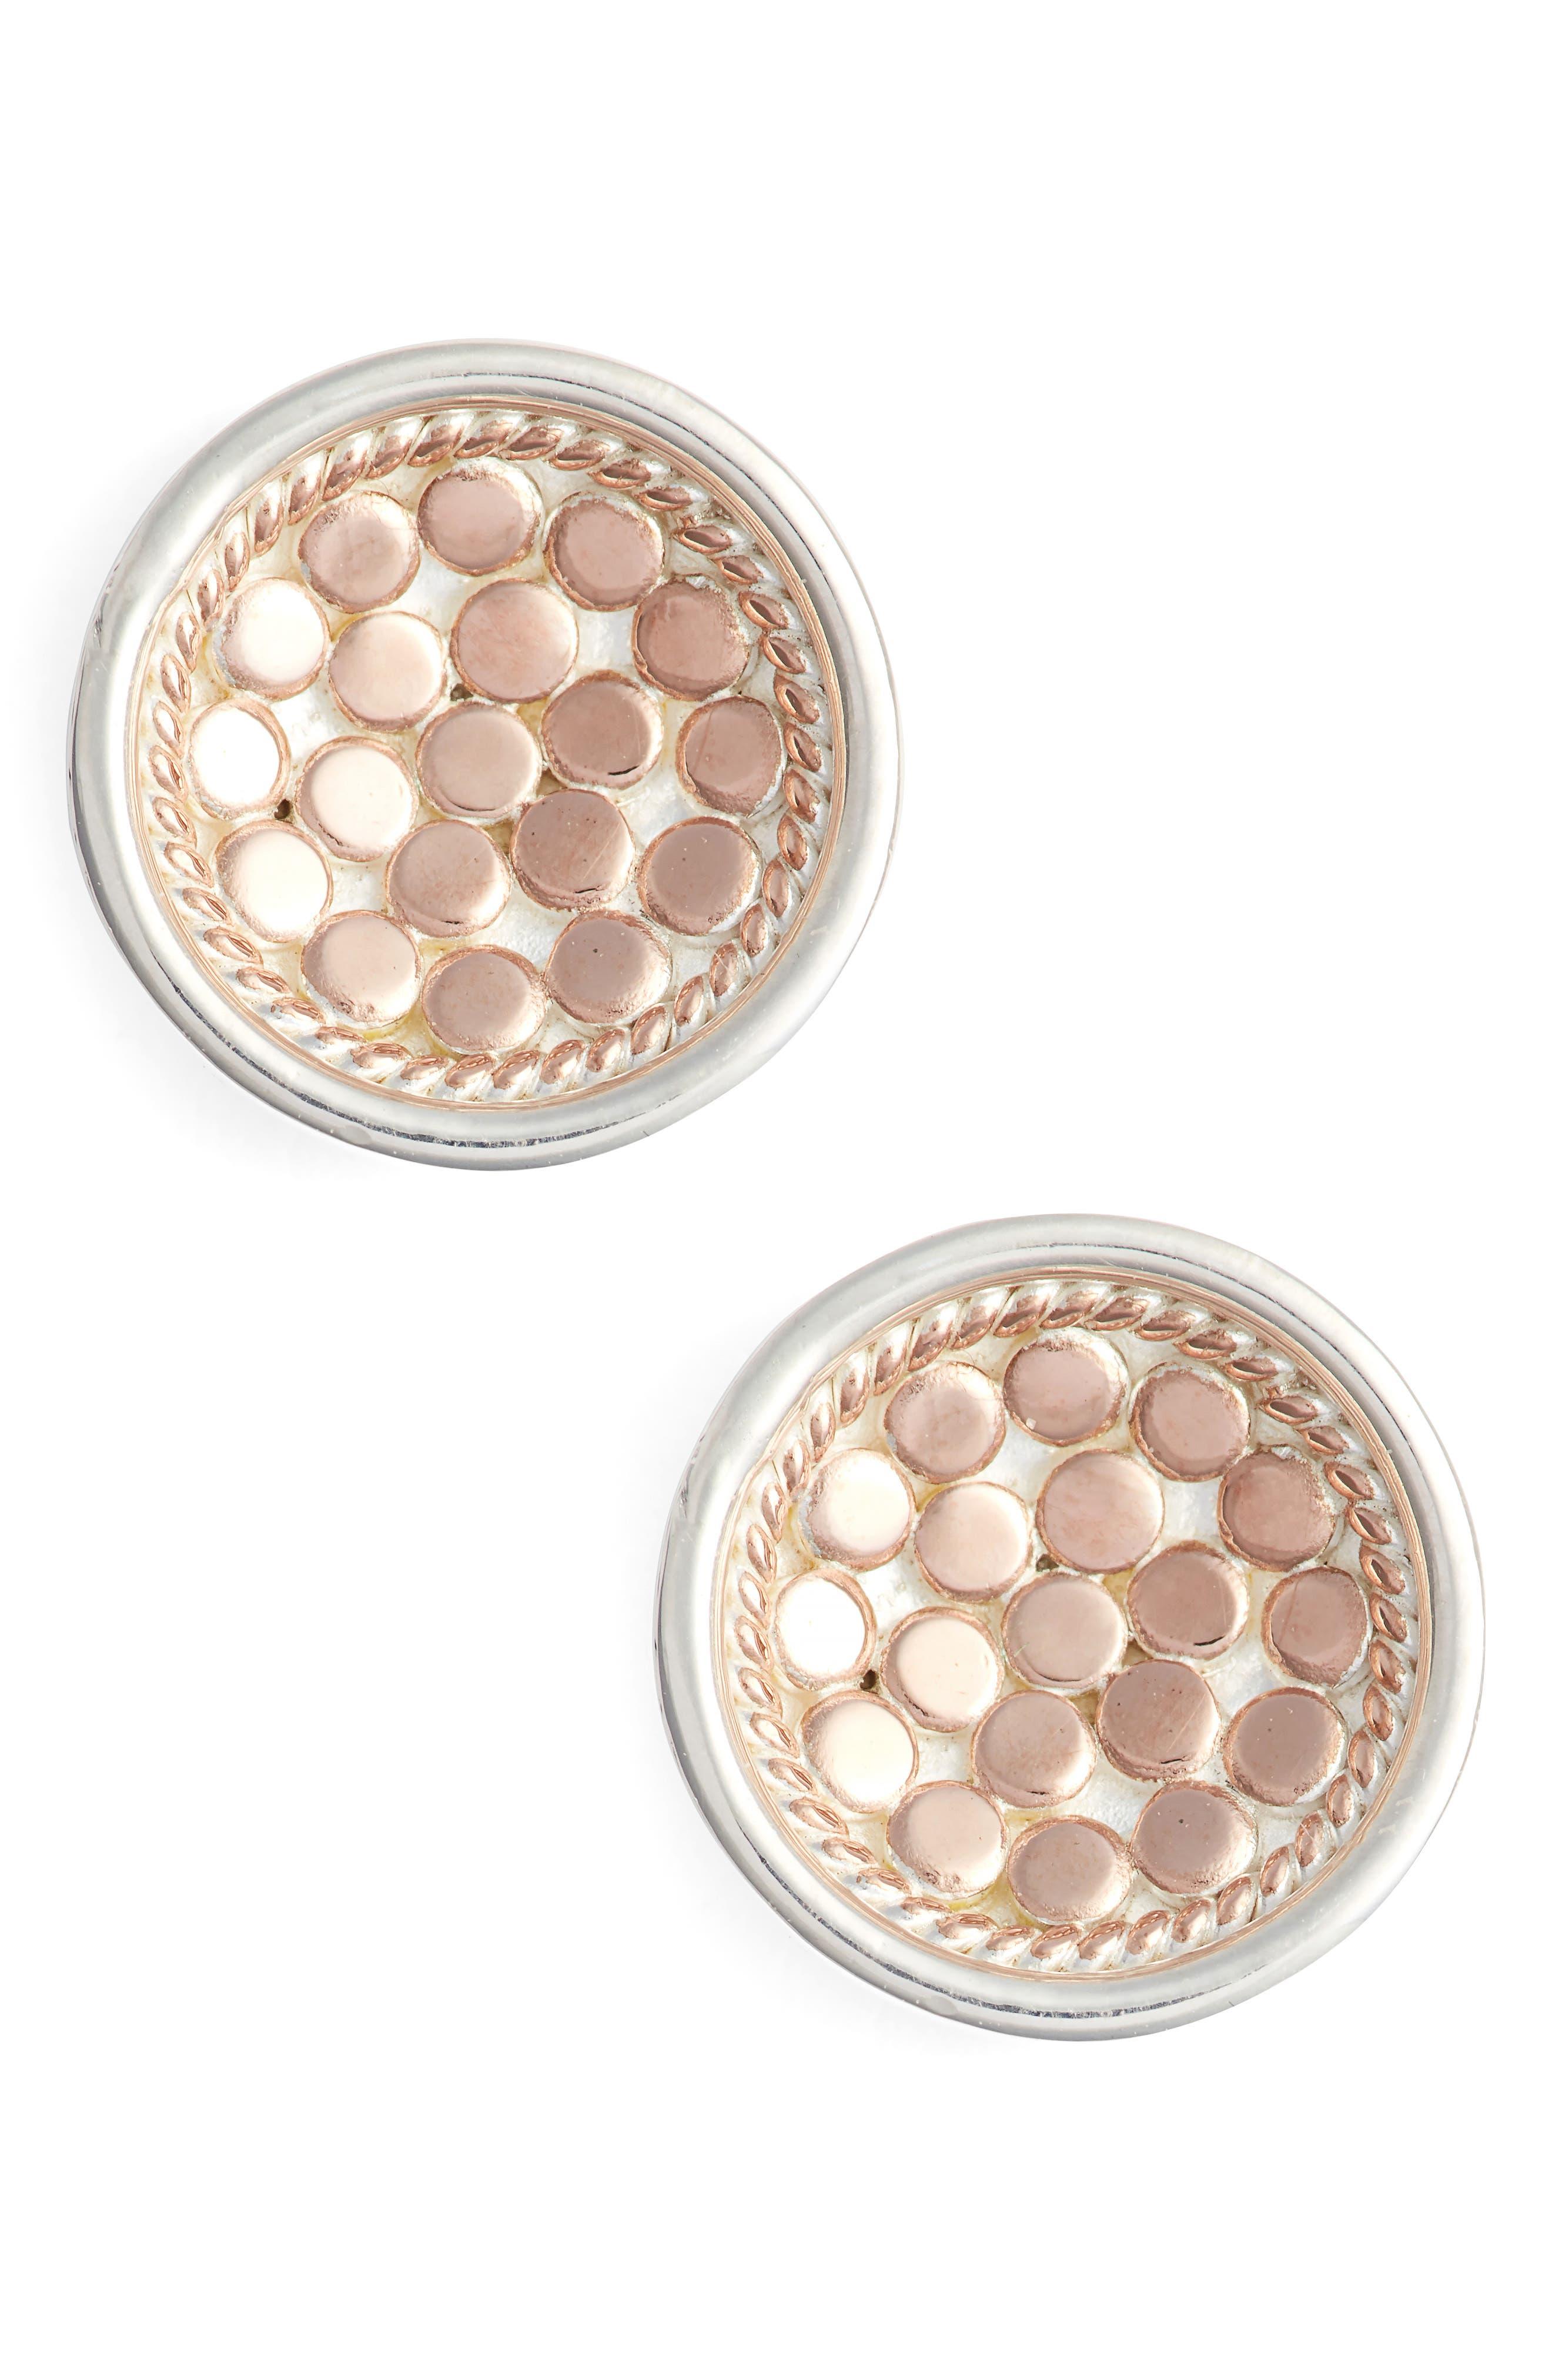 'Gili' Small Dish Stud Earrings,                             Main thumbnail 1, color,                             Rose Gold/ Silver